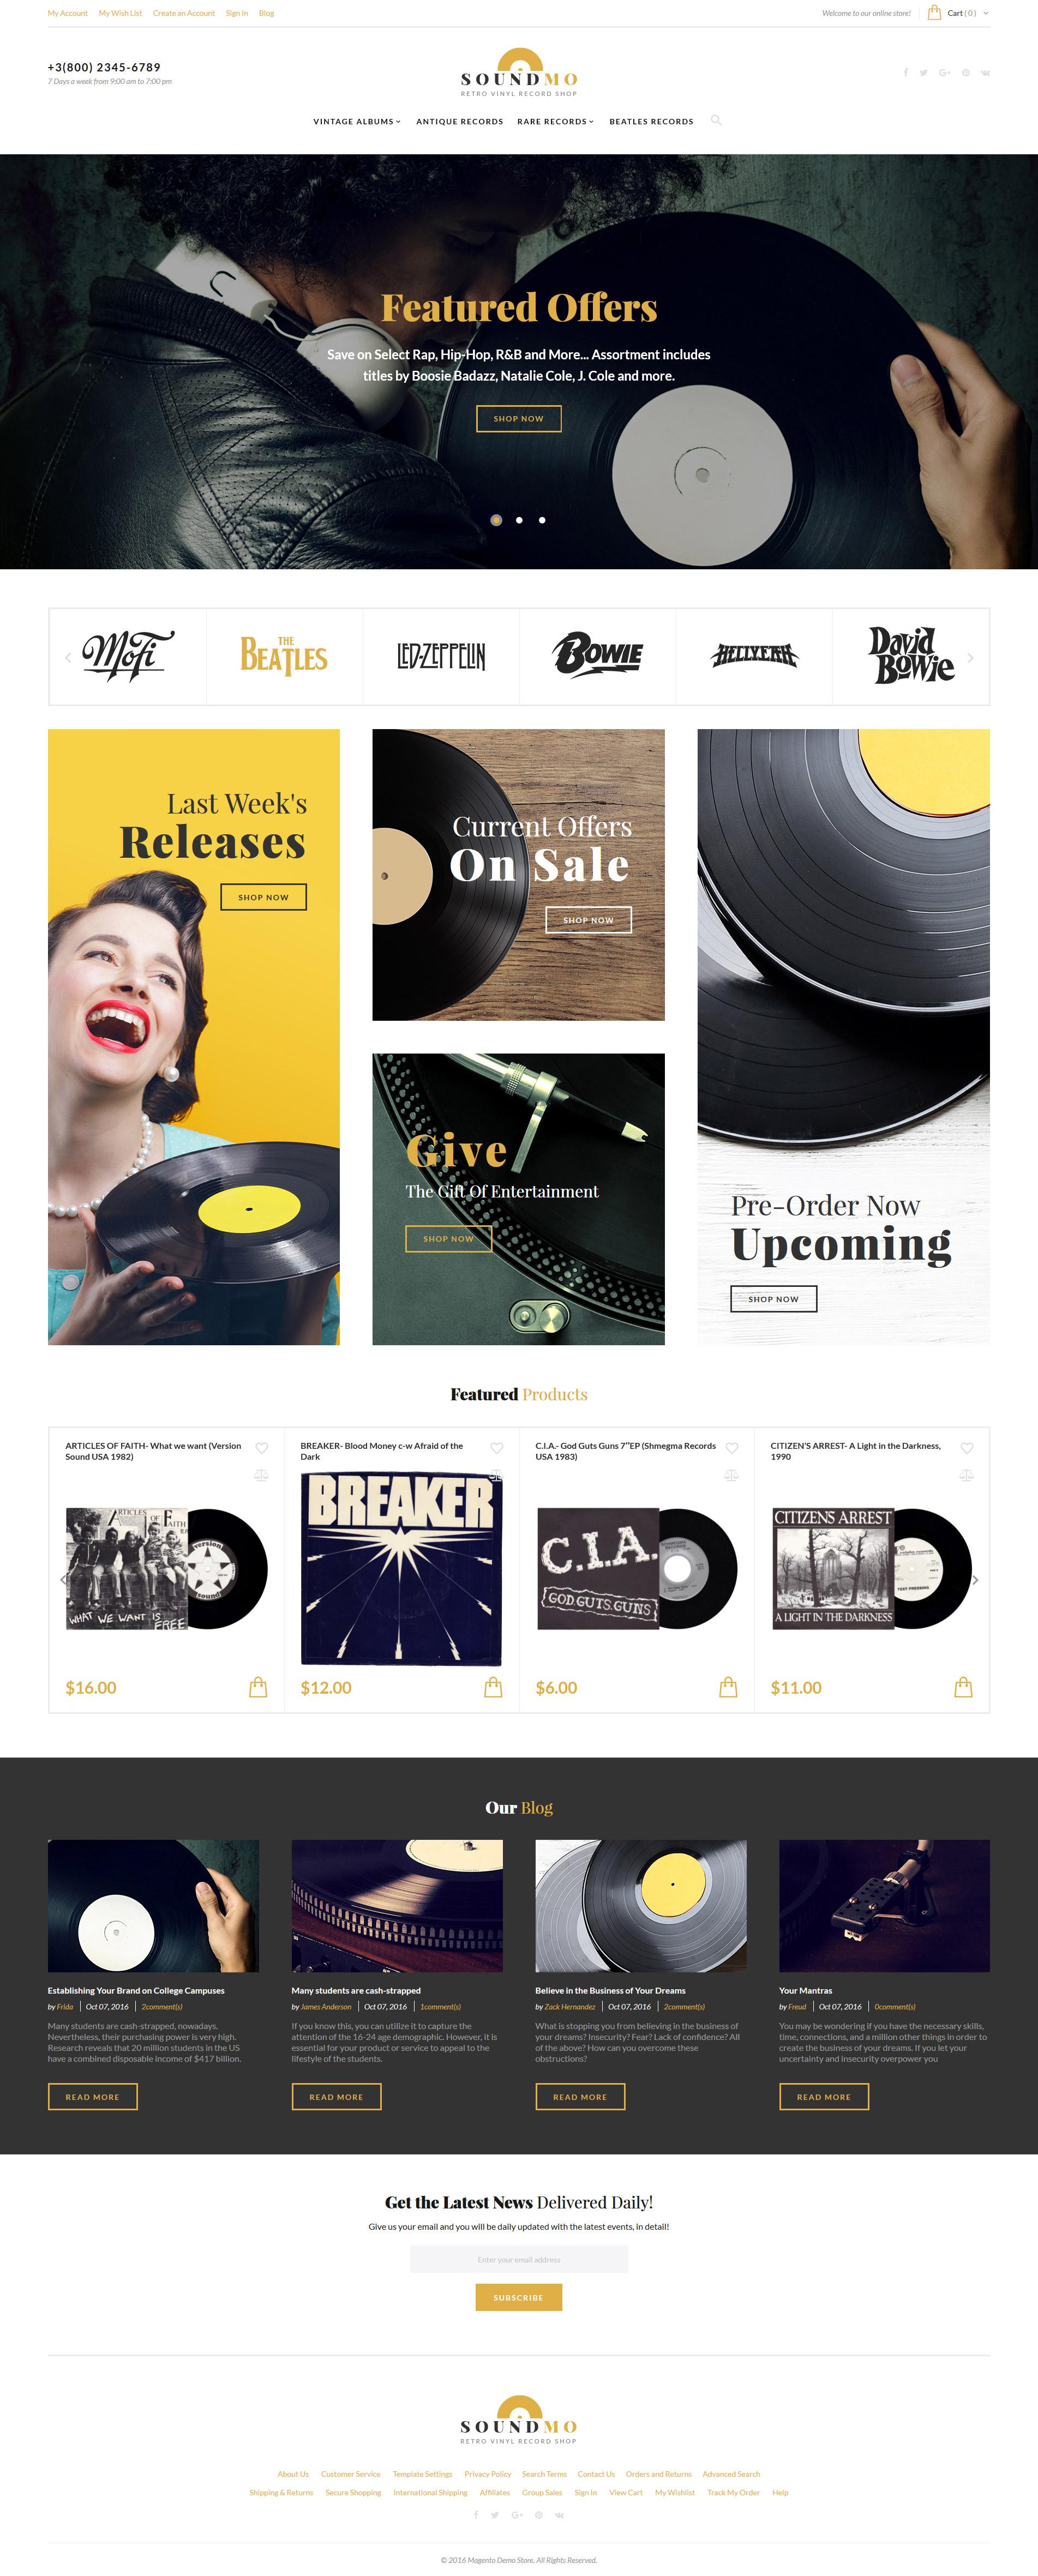 SoundMo - Vinyl & Audio Products Magento Theme